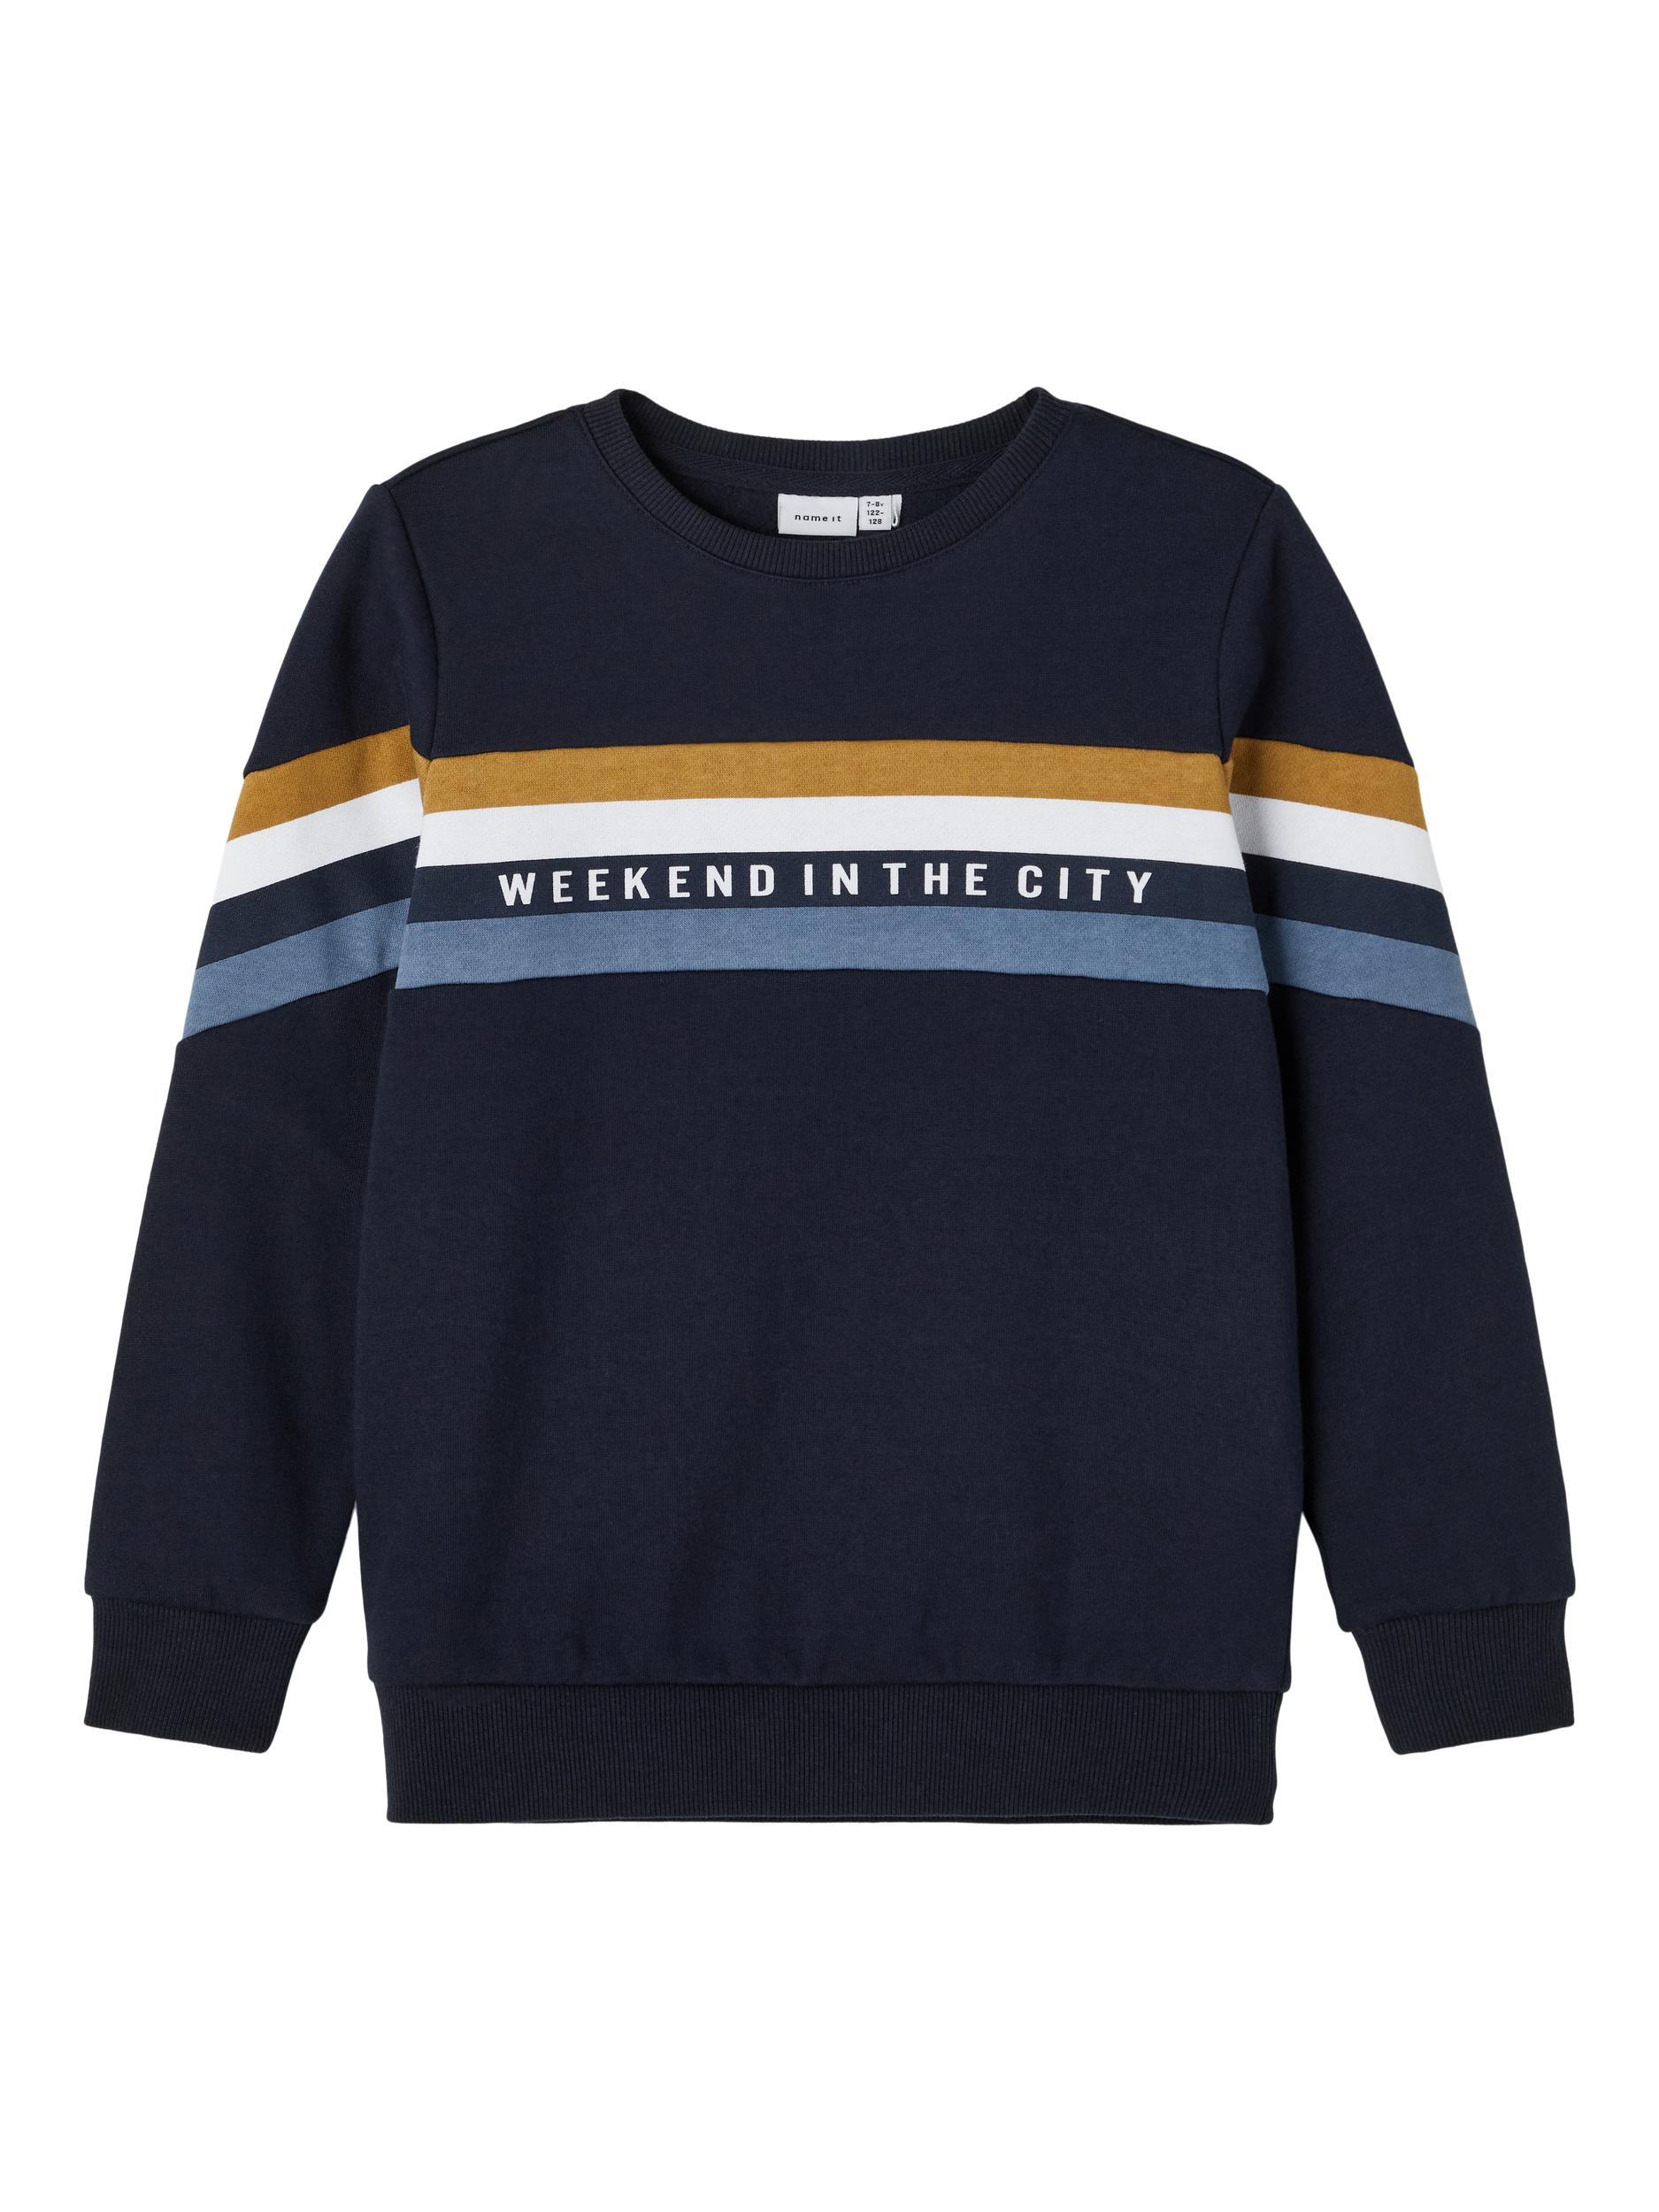 Name It Moton sweatshirt, dark sapphire, 116 cm